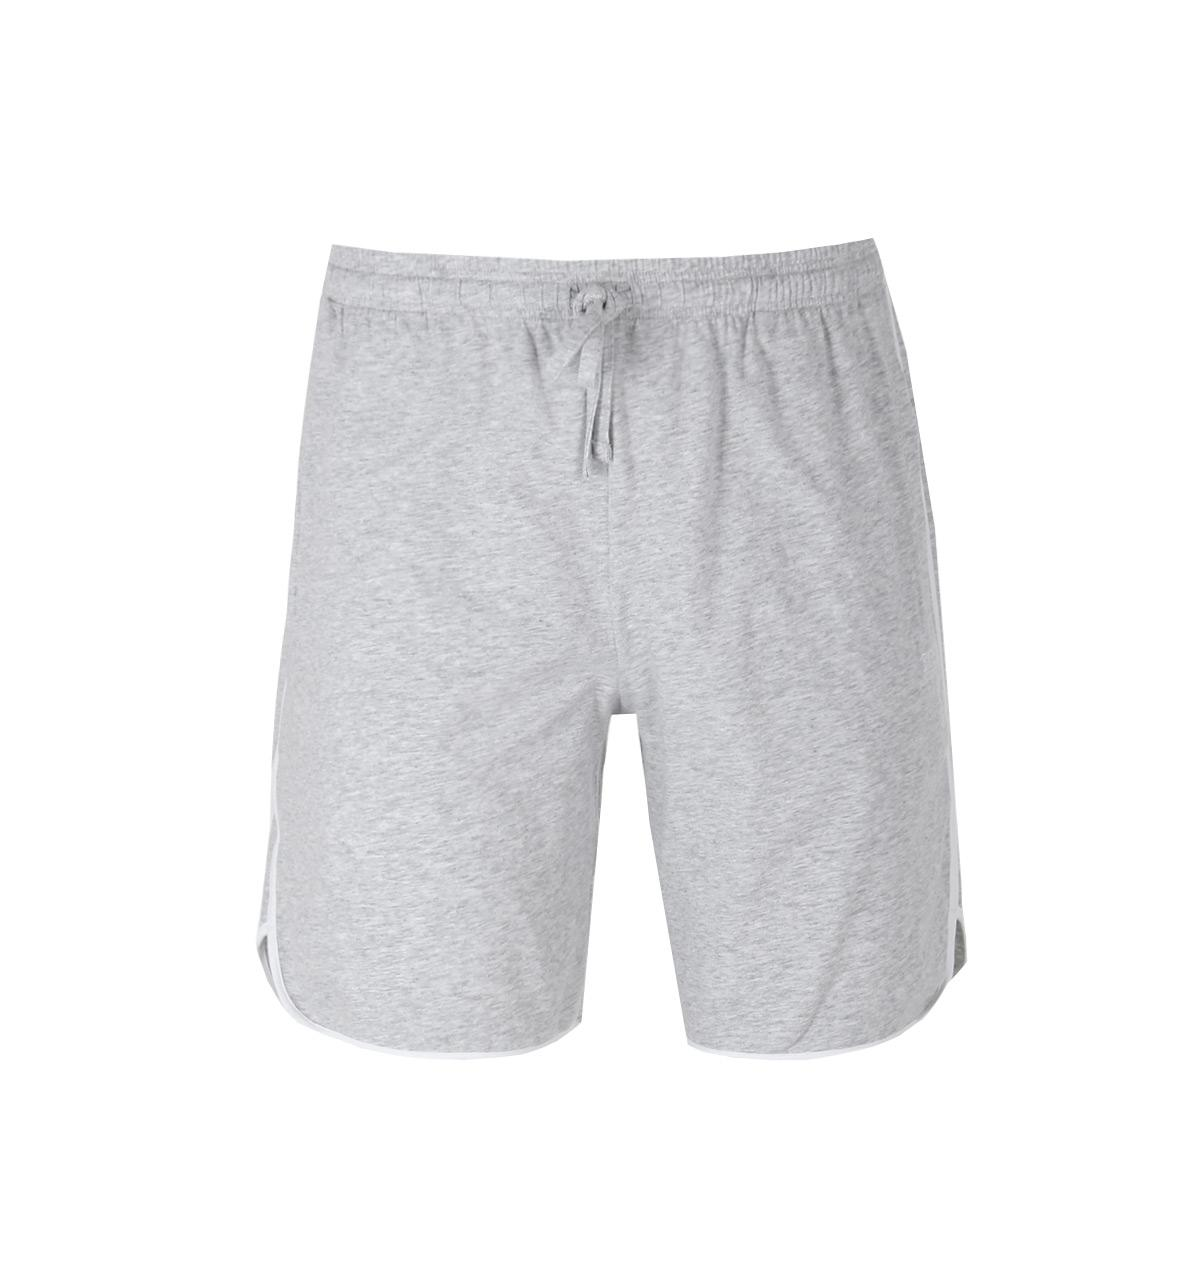 fabead555 BOSS by Hugo Boss Boss Mix&match Grey Shorts in Gray for Men - Lyst